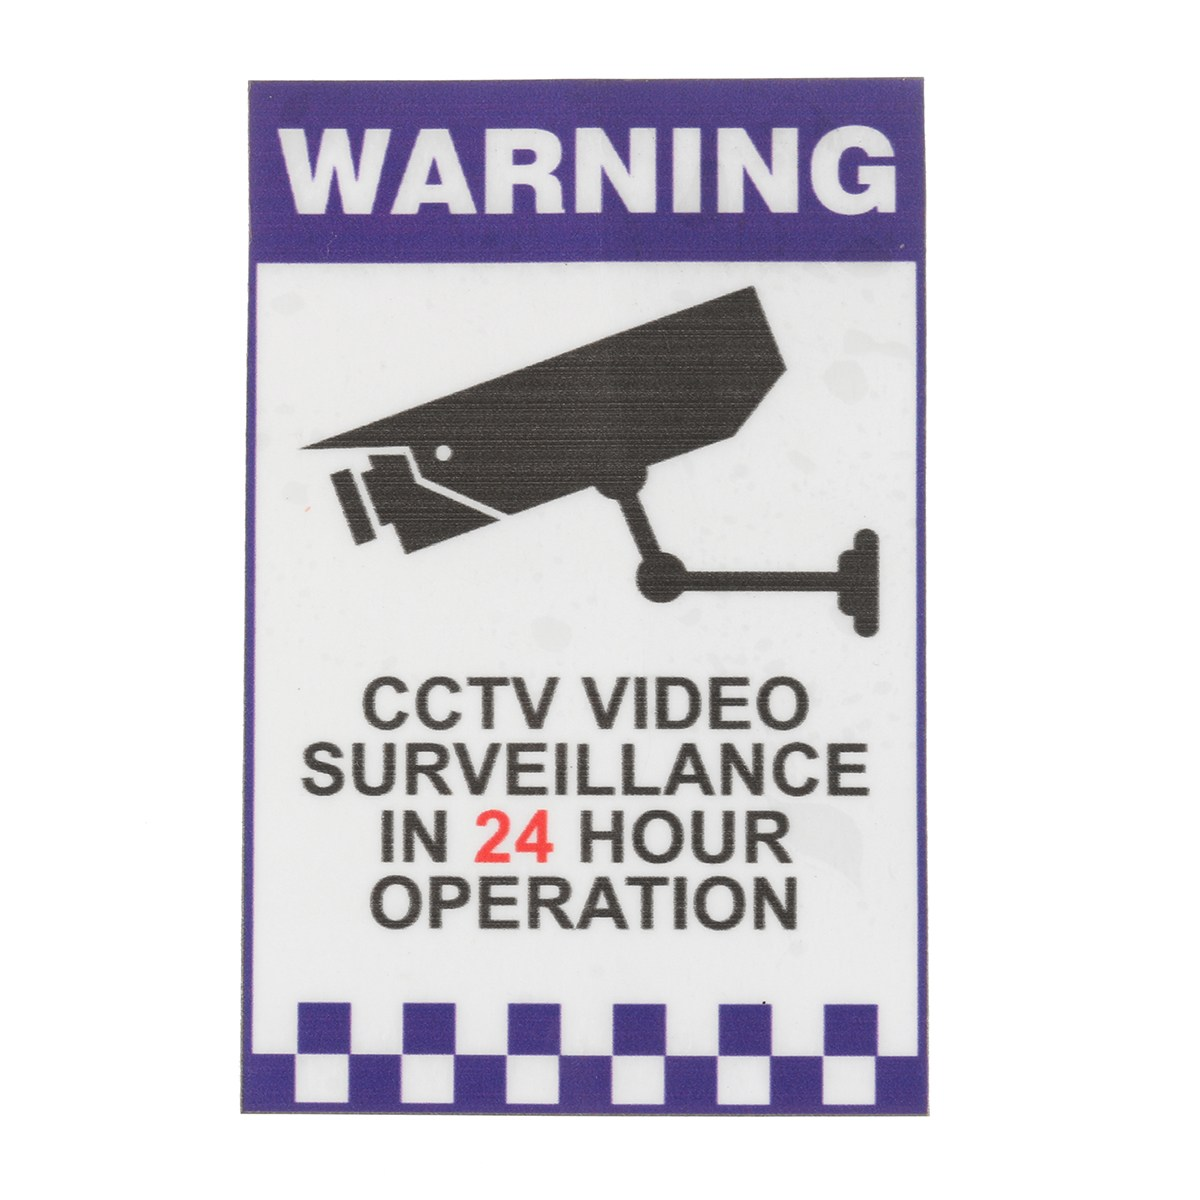 Safurance 24 Hour Internal Warning CCTV Security Surveillance Camera Decal Sticker Sign Home Safety